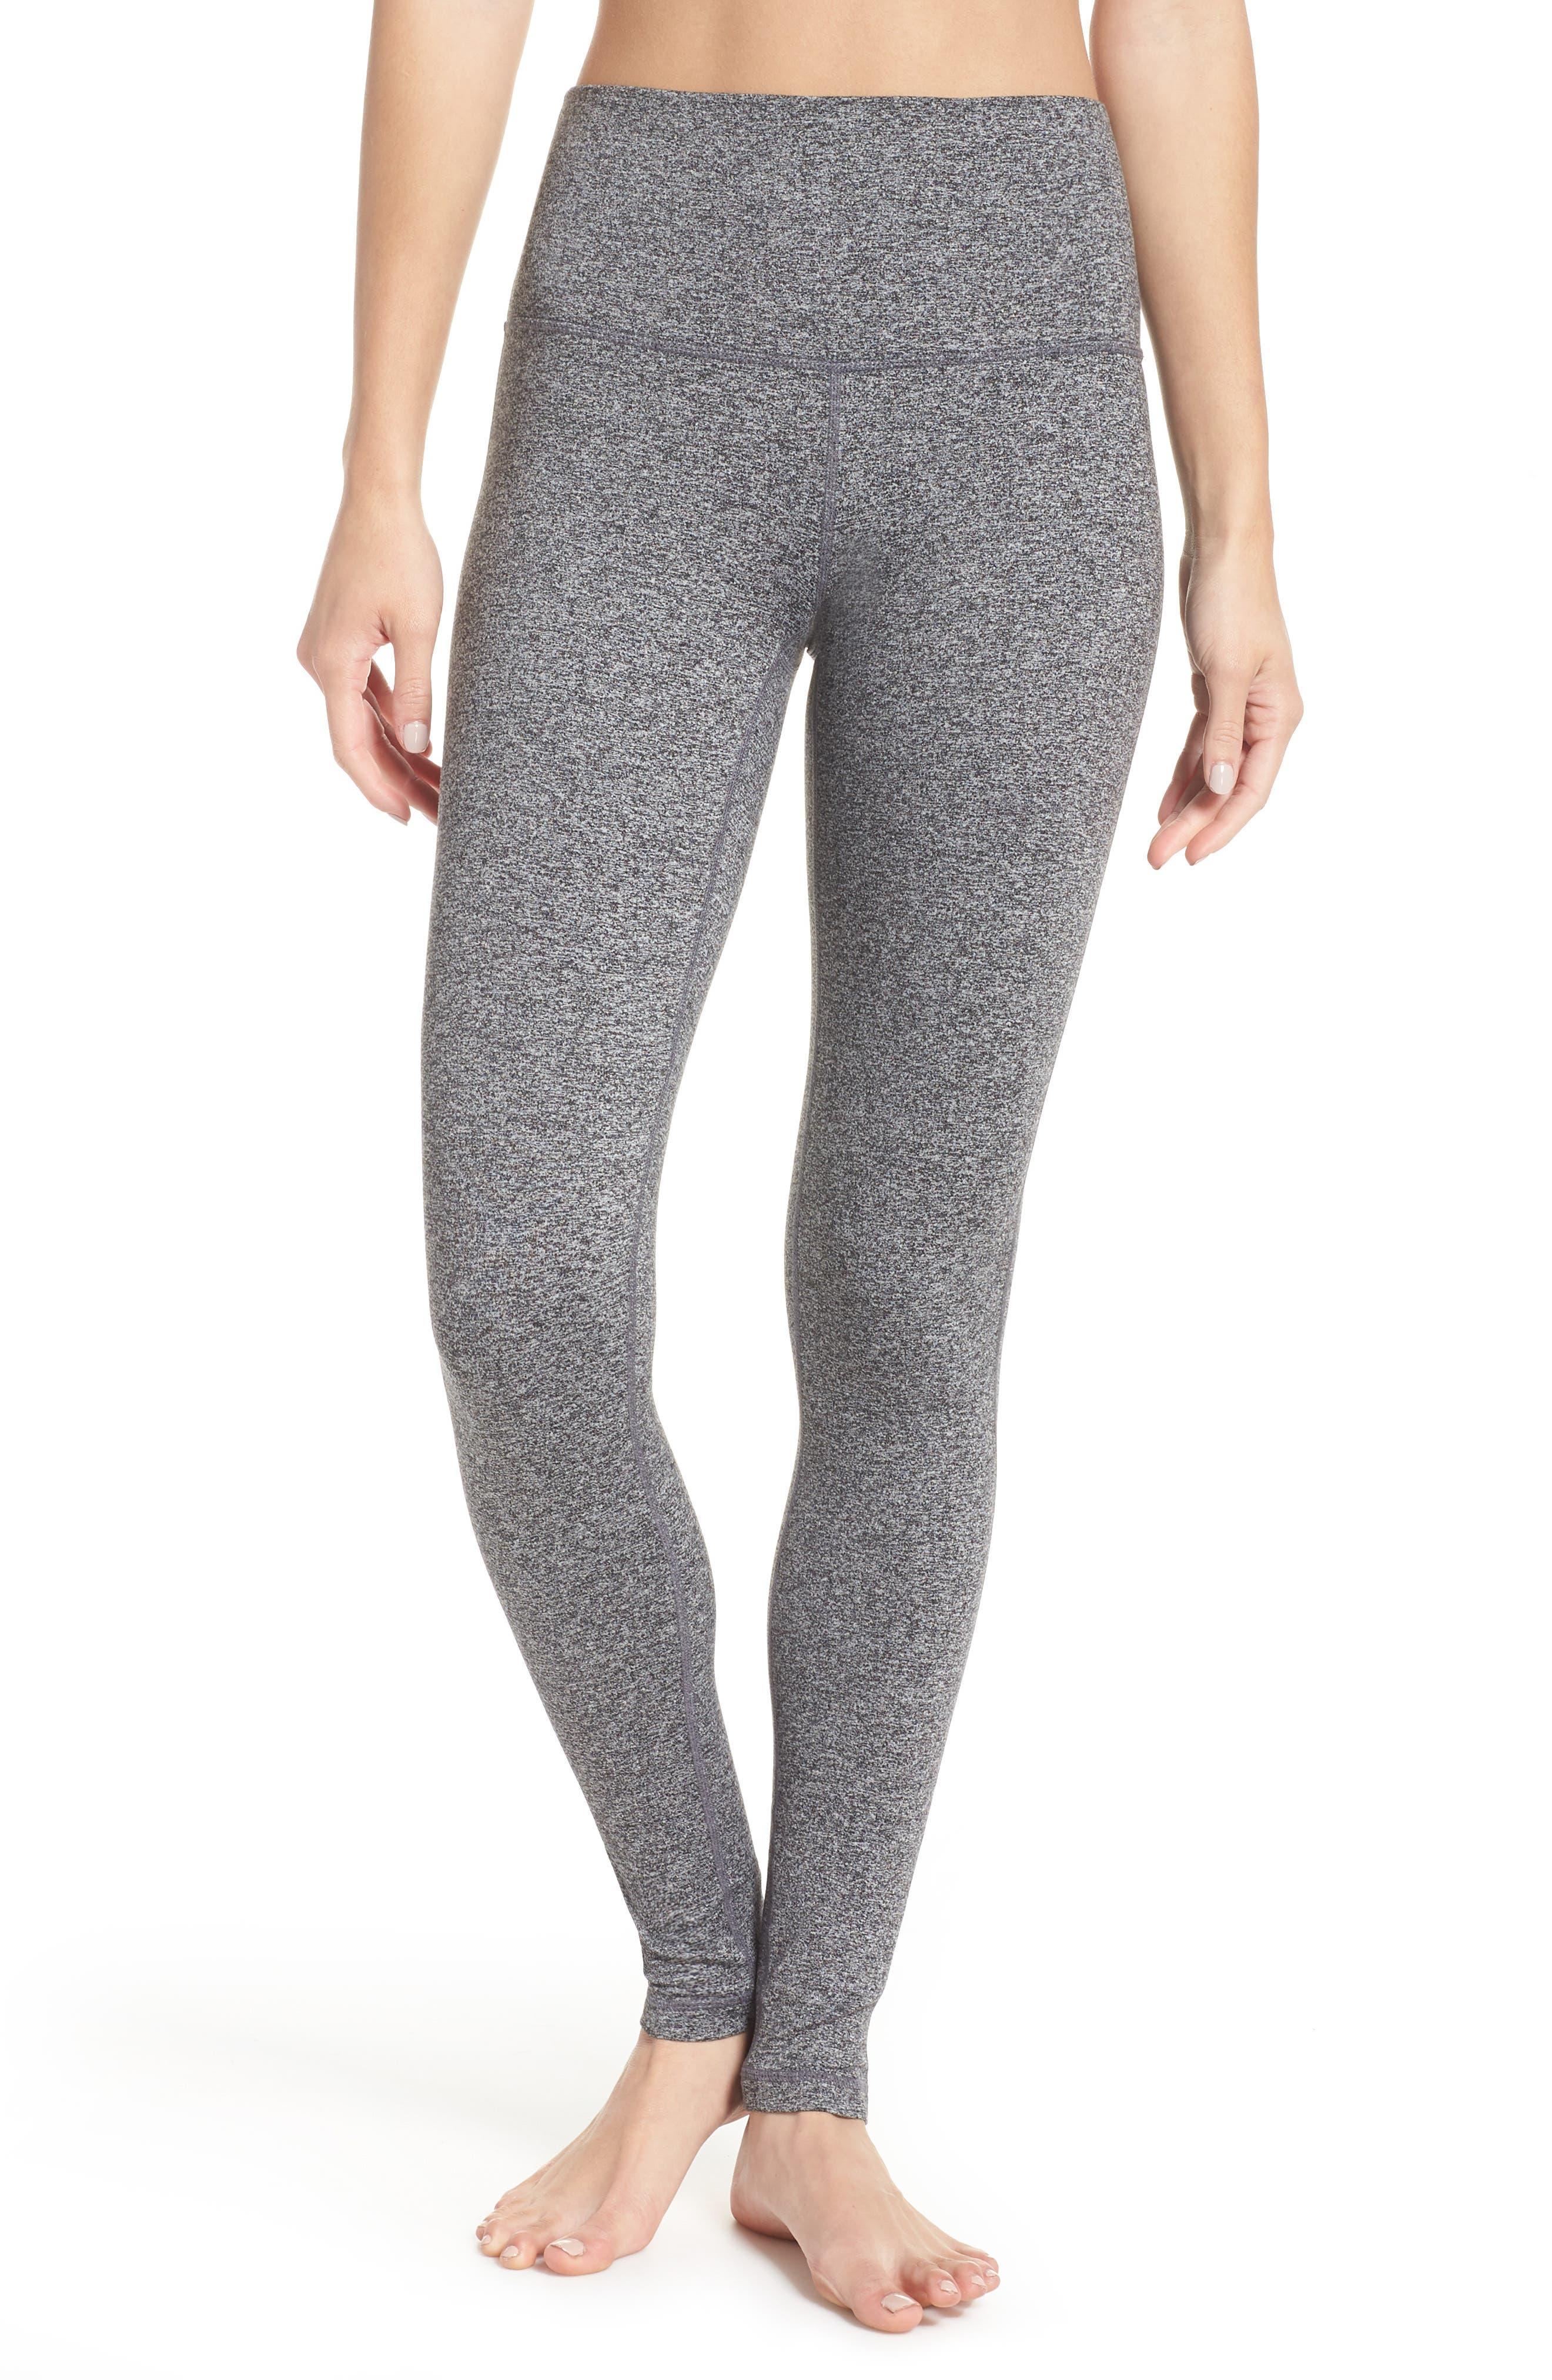 8c030d60e8542 zella pants & leggings activewear for women - Buy best women's zella pants  & leggings activewear on Cools.com Shop